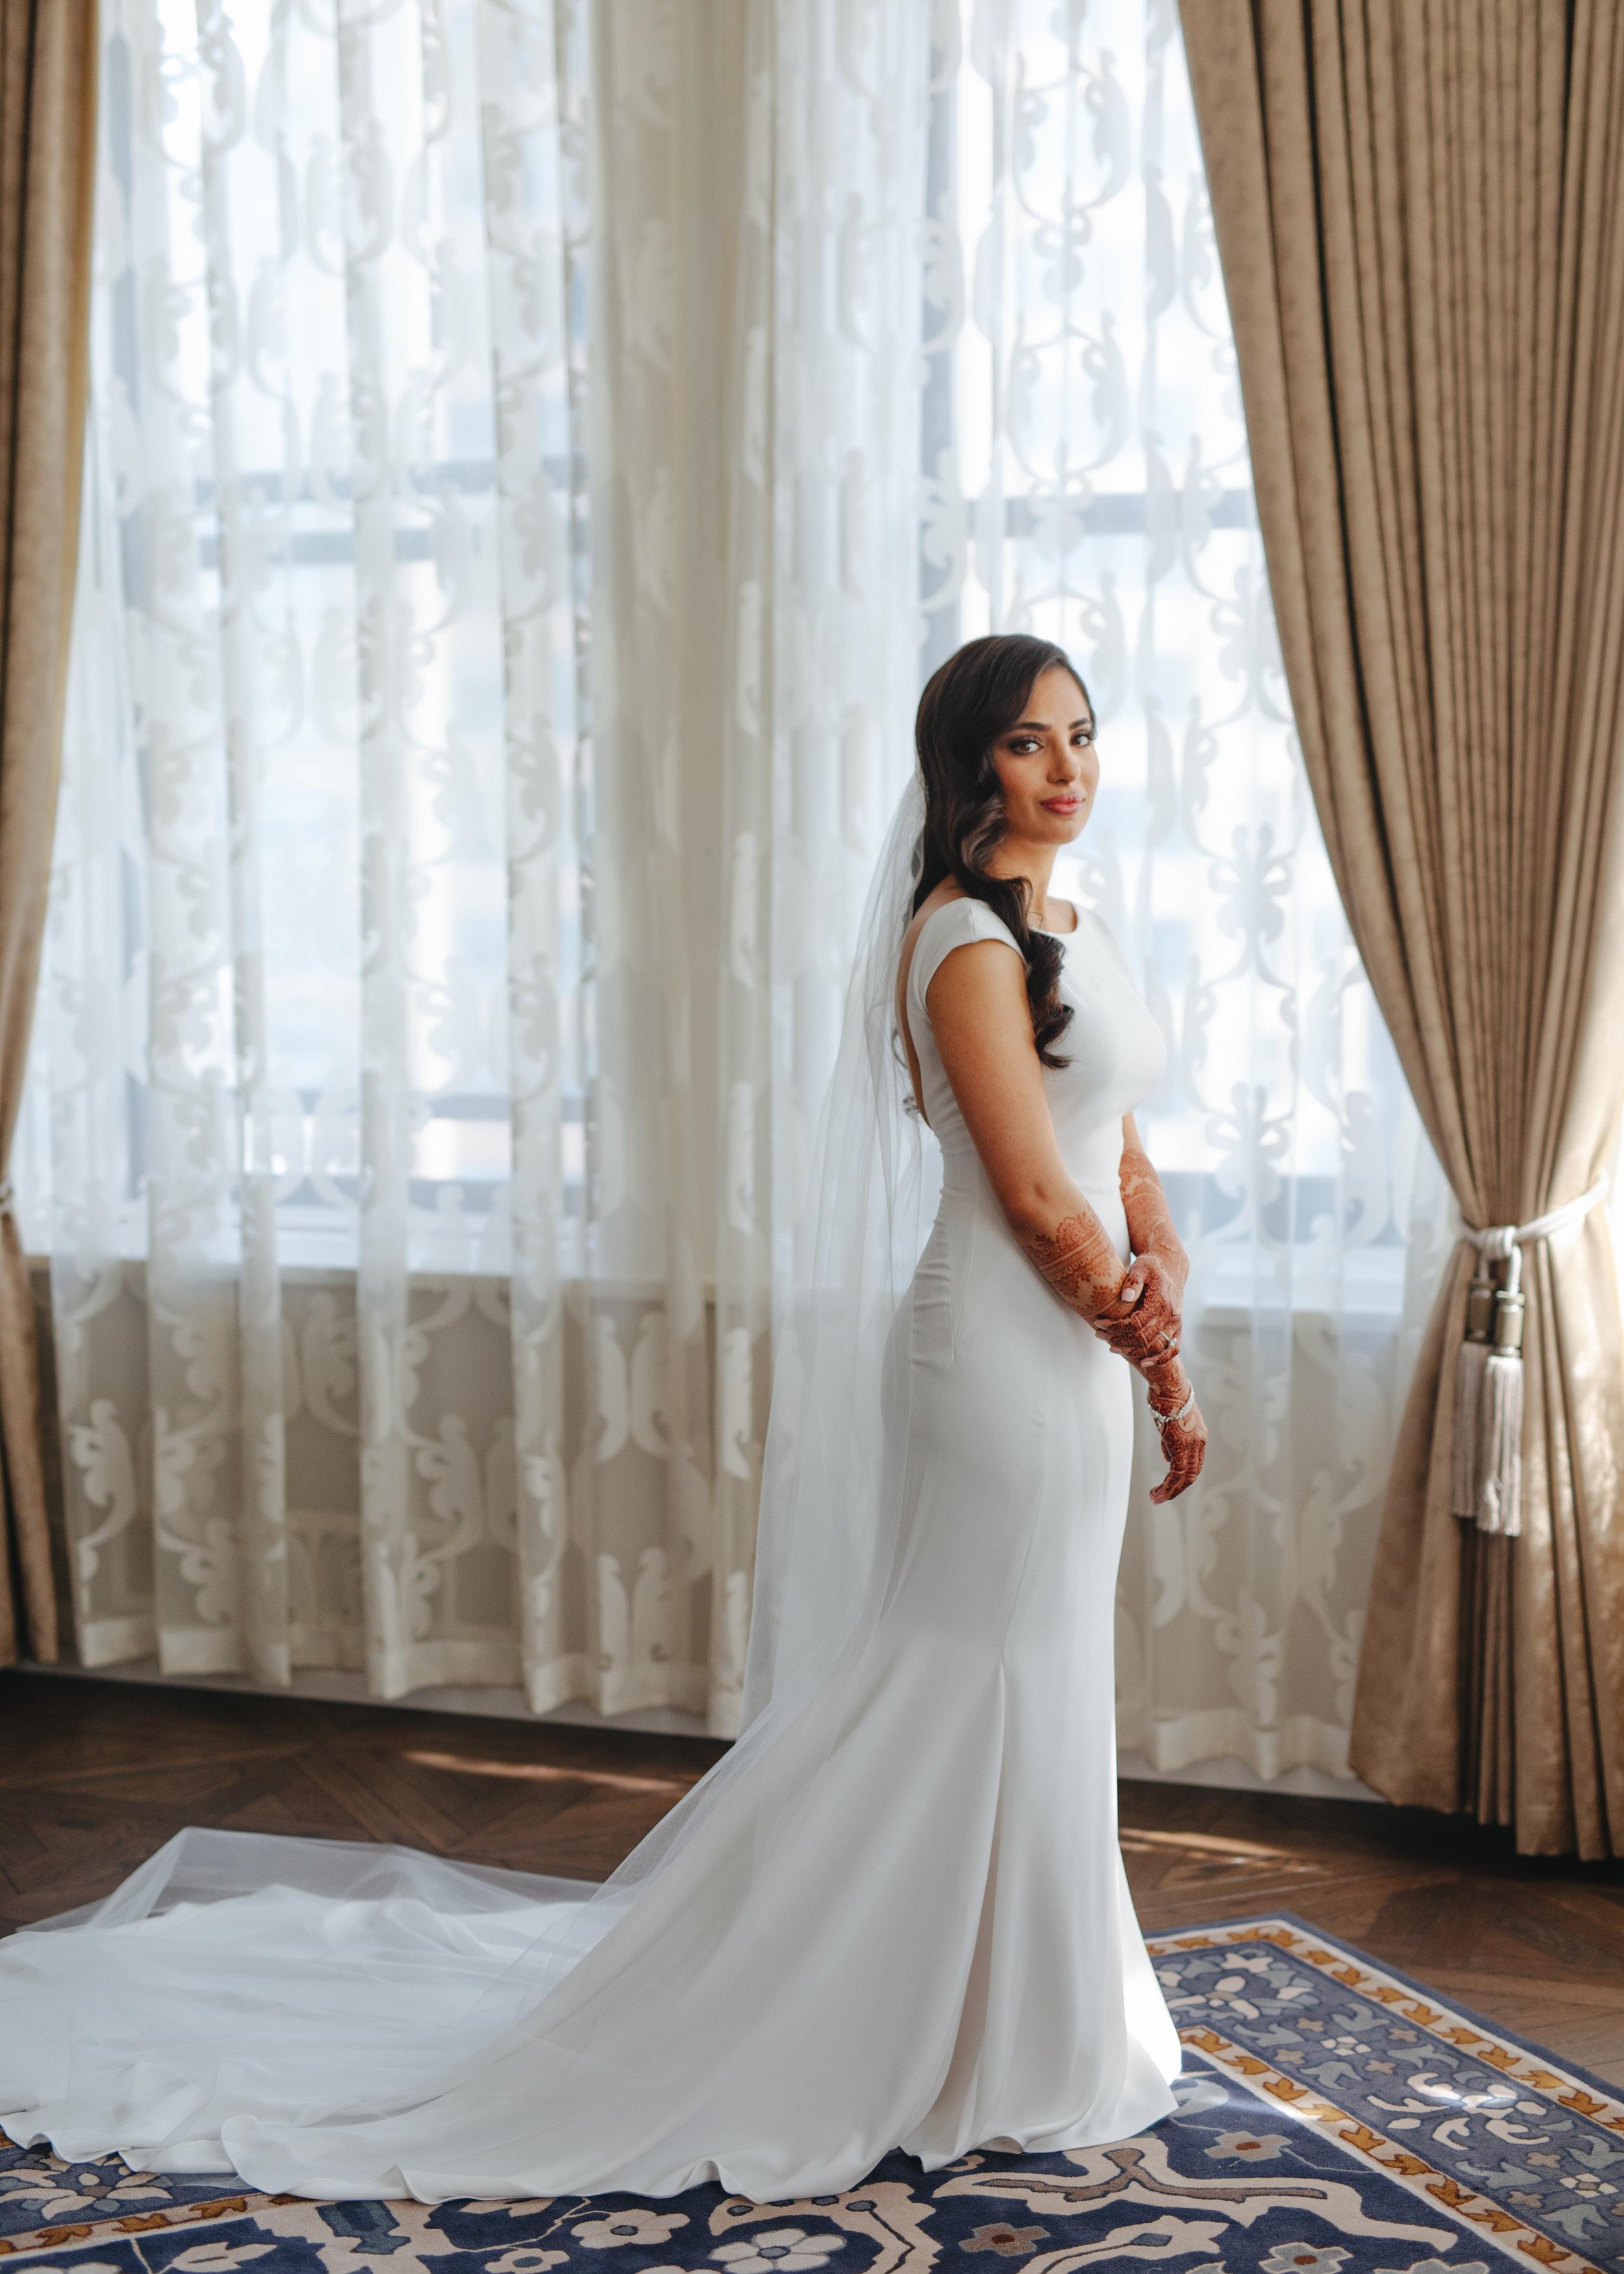 herastudios_wedding_aneesha_kris_hera_selects-14a.jpg